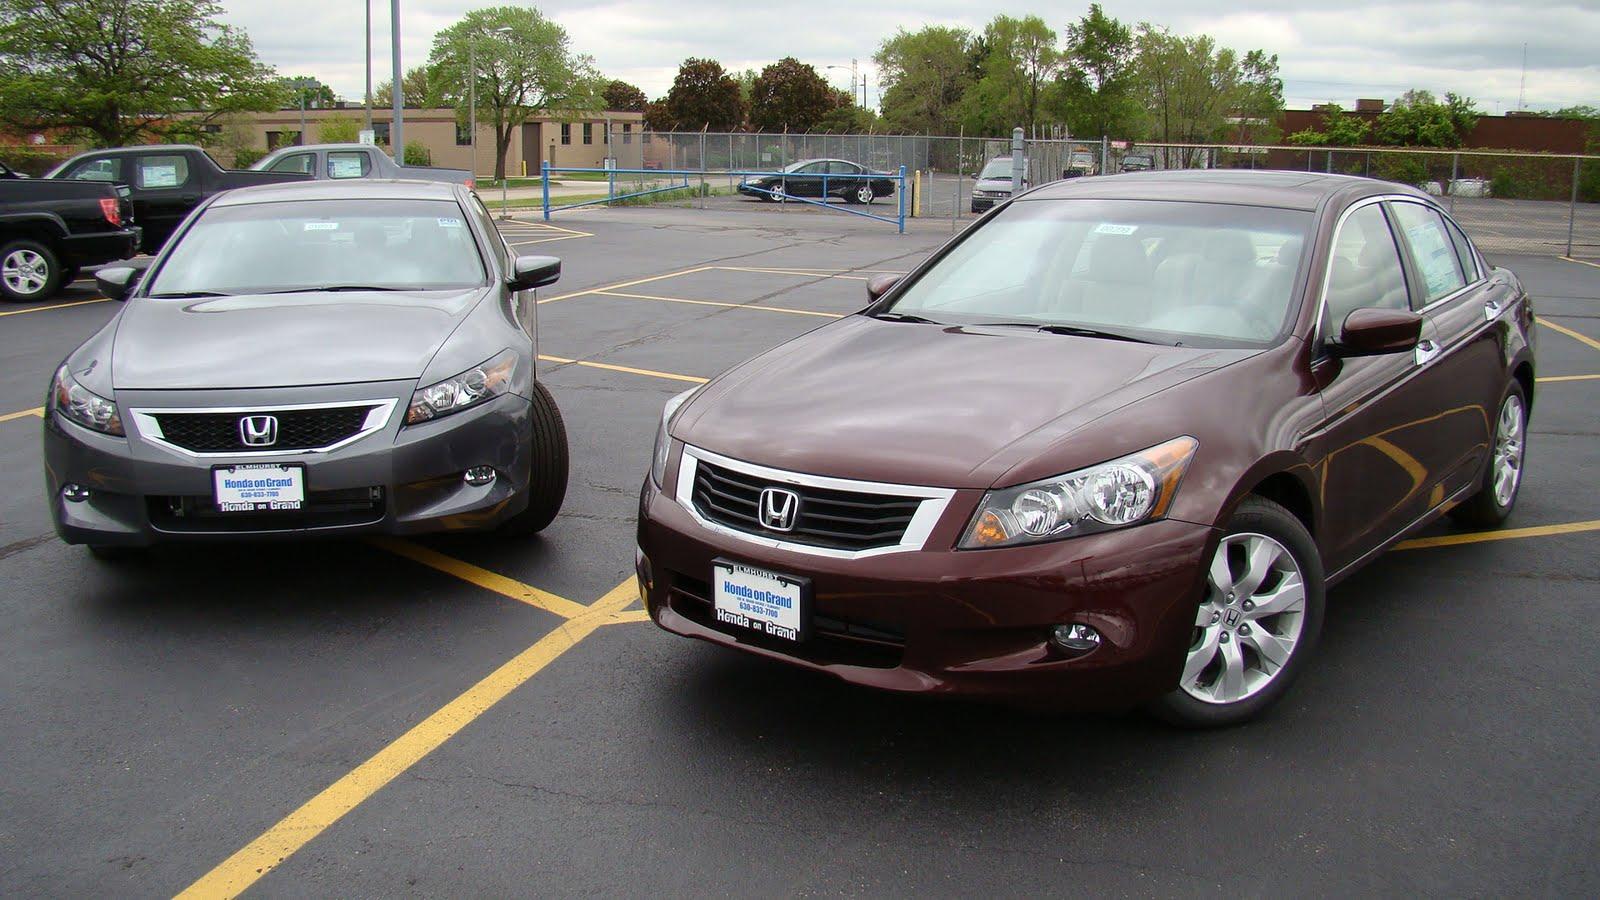 Honda On Grand Accord Coupe Vs Accord Sedan